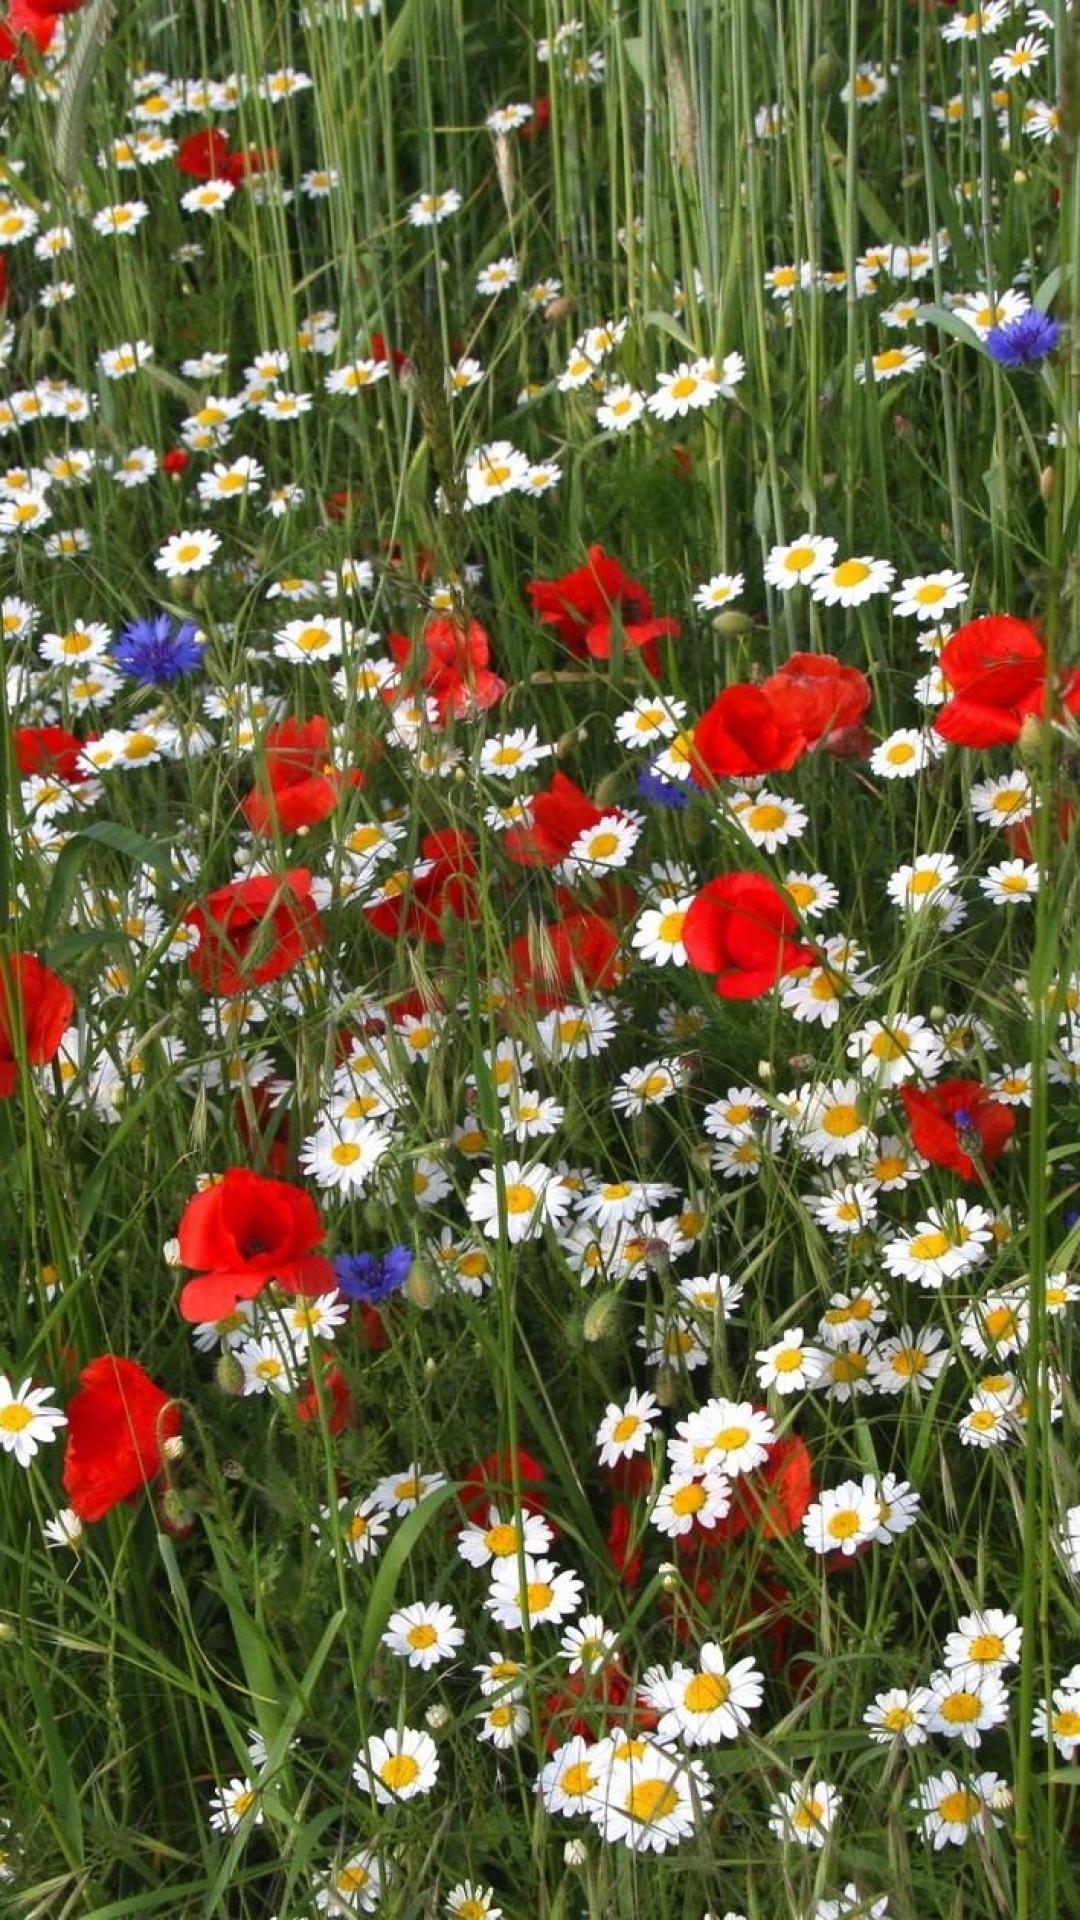 1080x1920-daisies-poppies-cornflowers-grass-meadow-summer-wallpaper-wpc900490